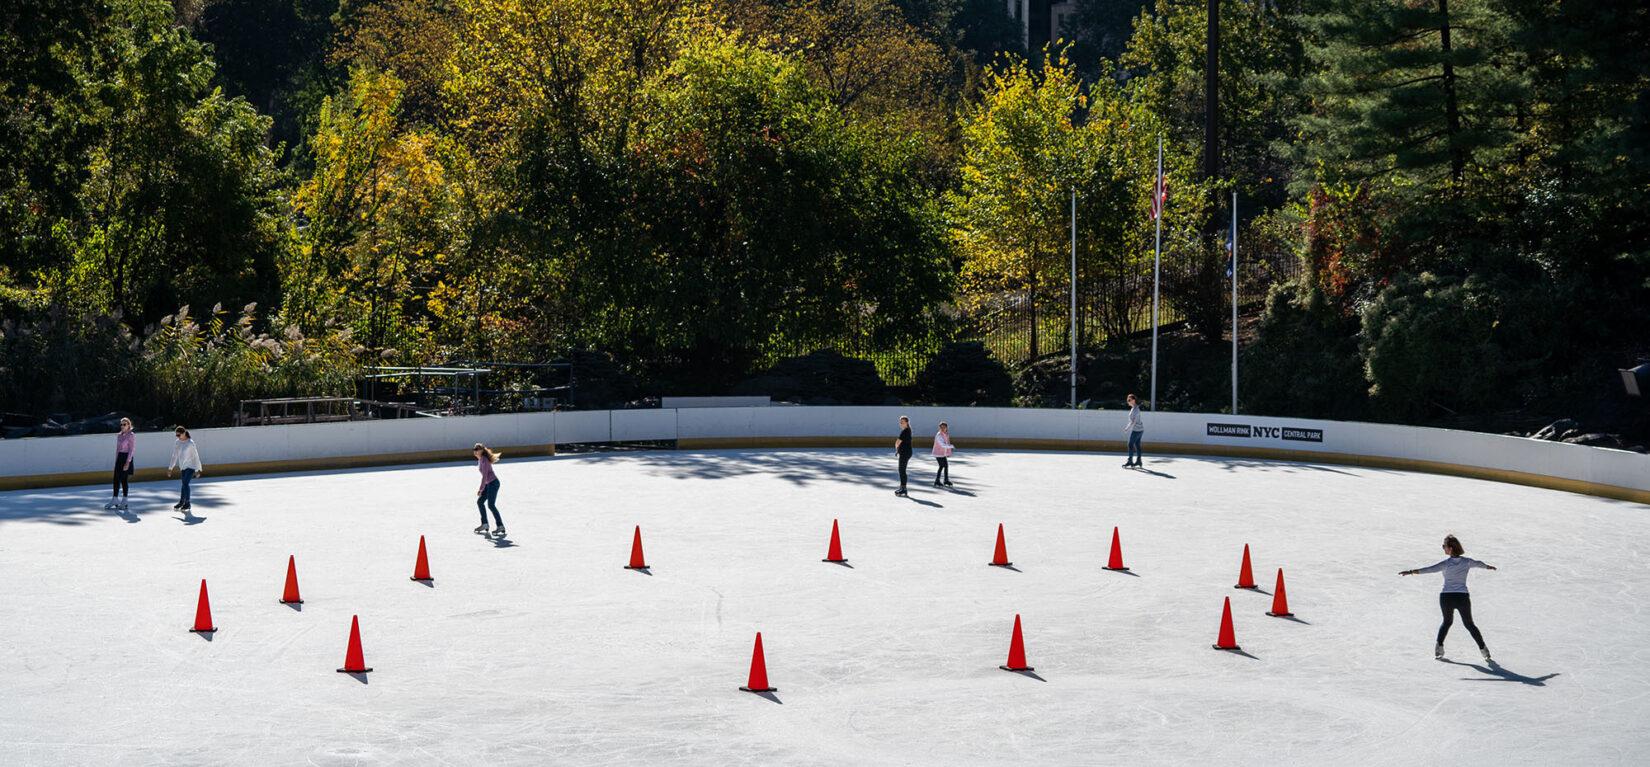 Wollman Ice Rink 20191024 02670